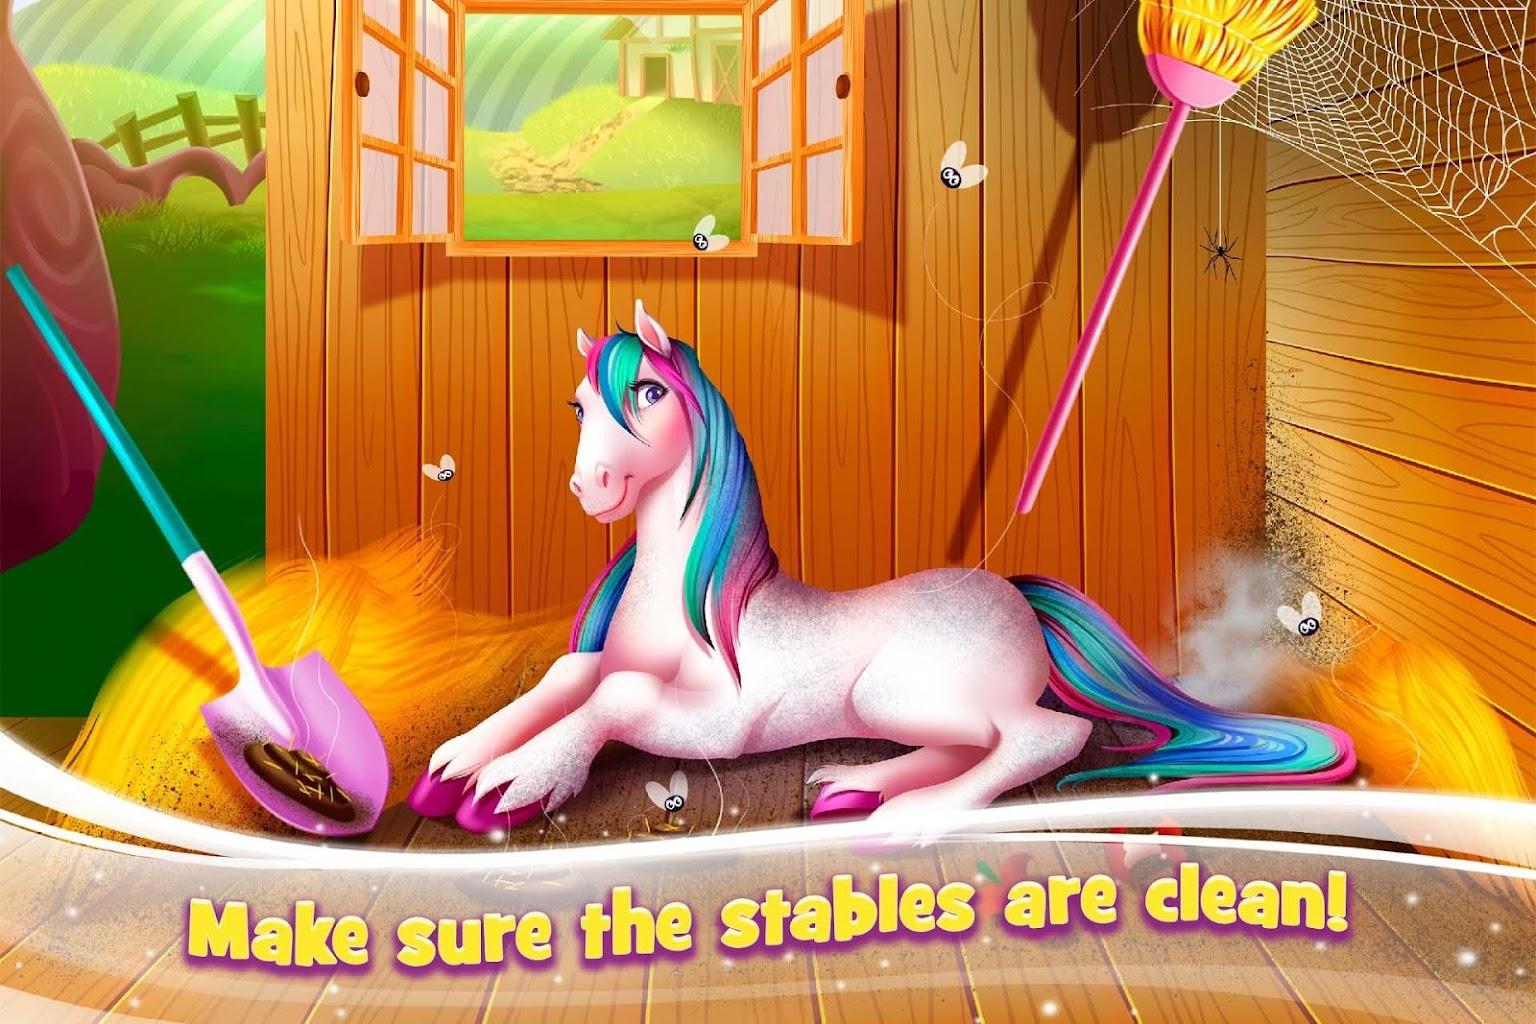 Kuda Pelangi Peduli Salon Kecantikan Putri Poni Untuk Android Apk Unduh